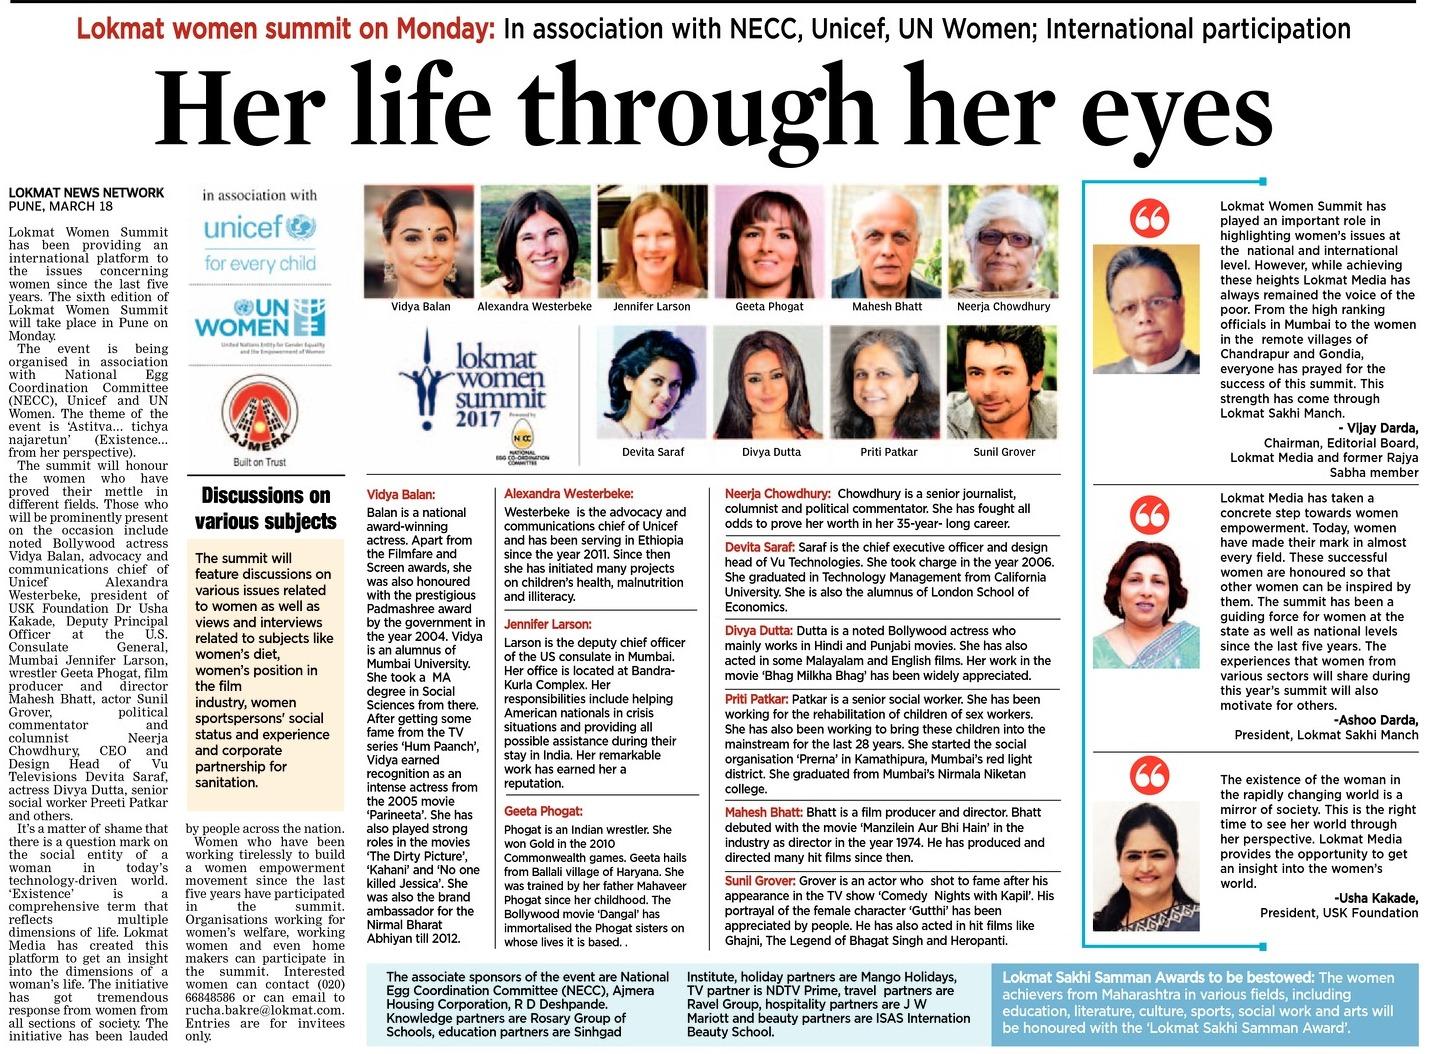 Her life through her eyes